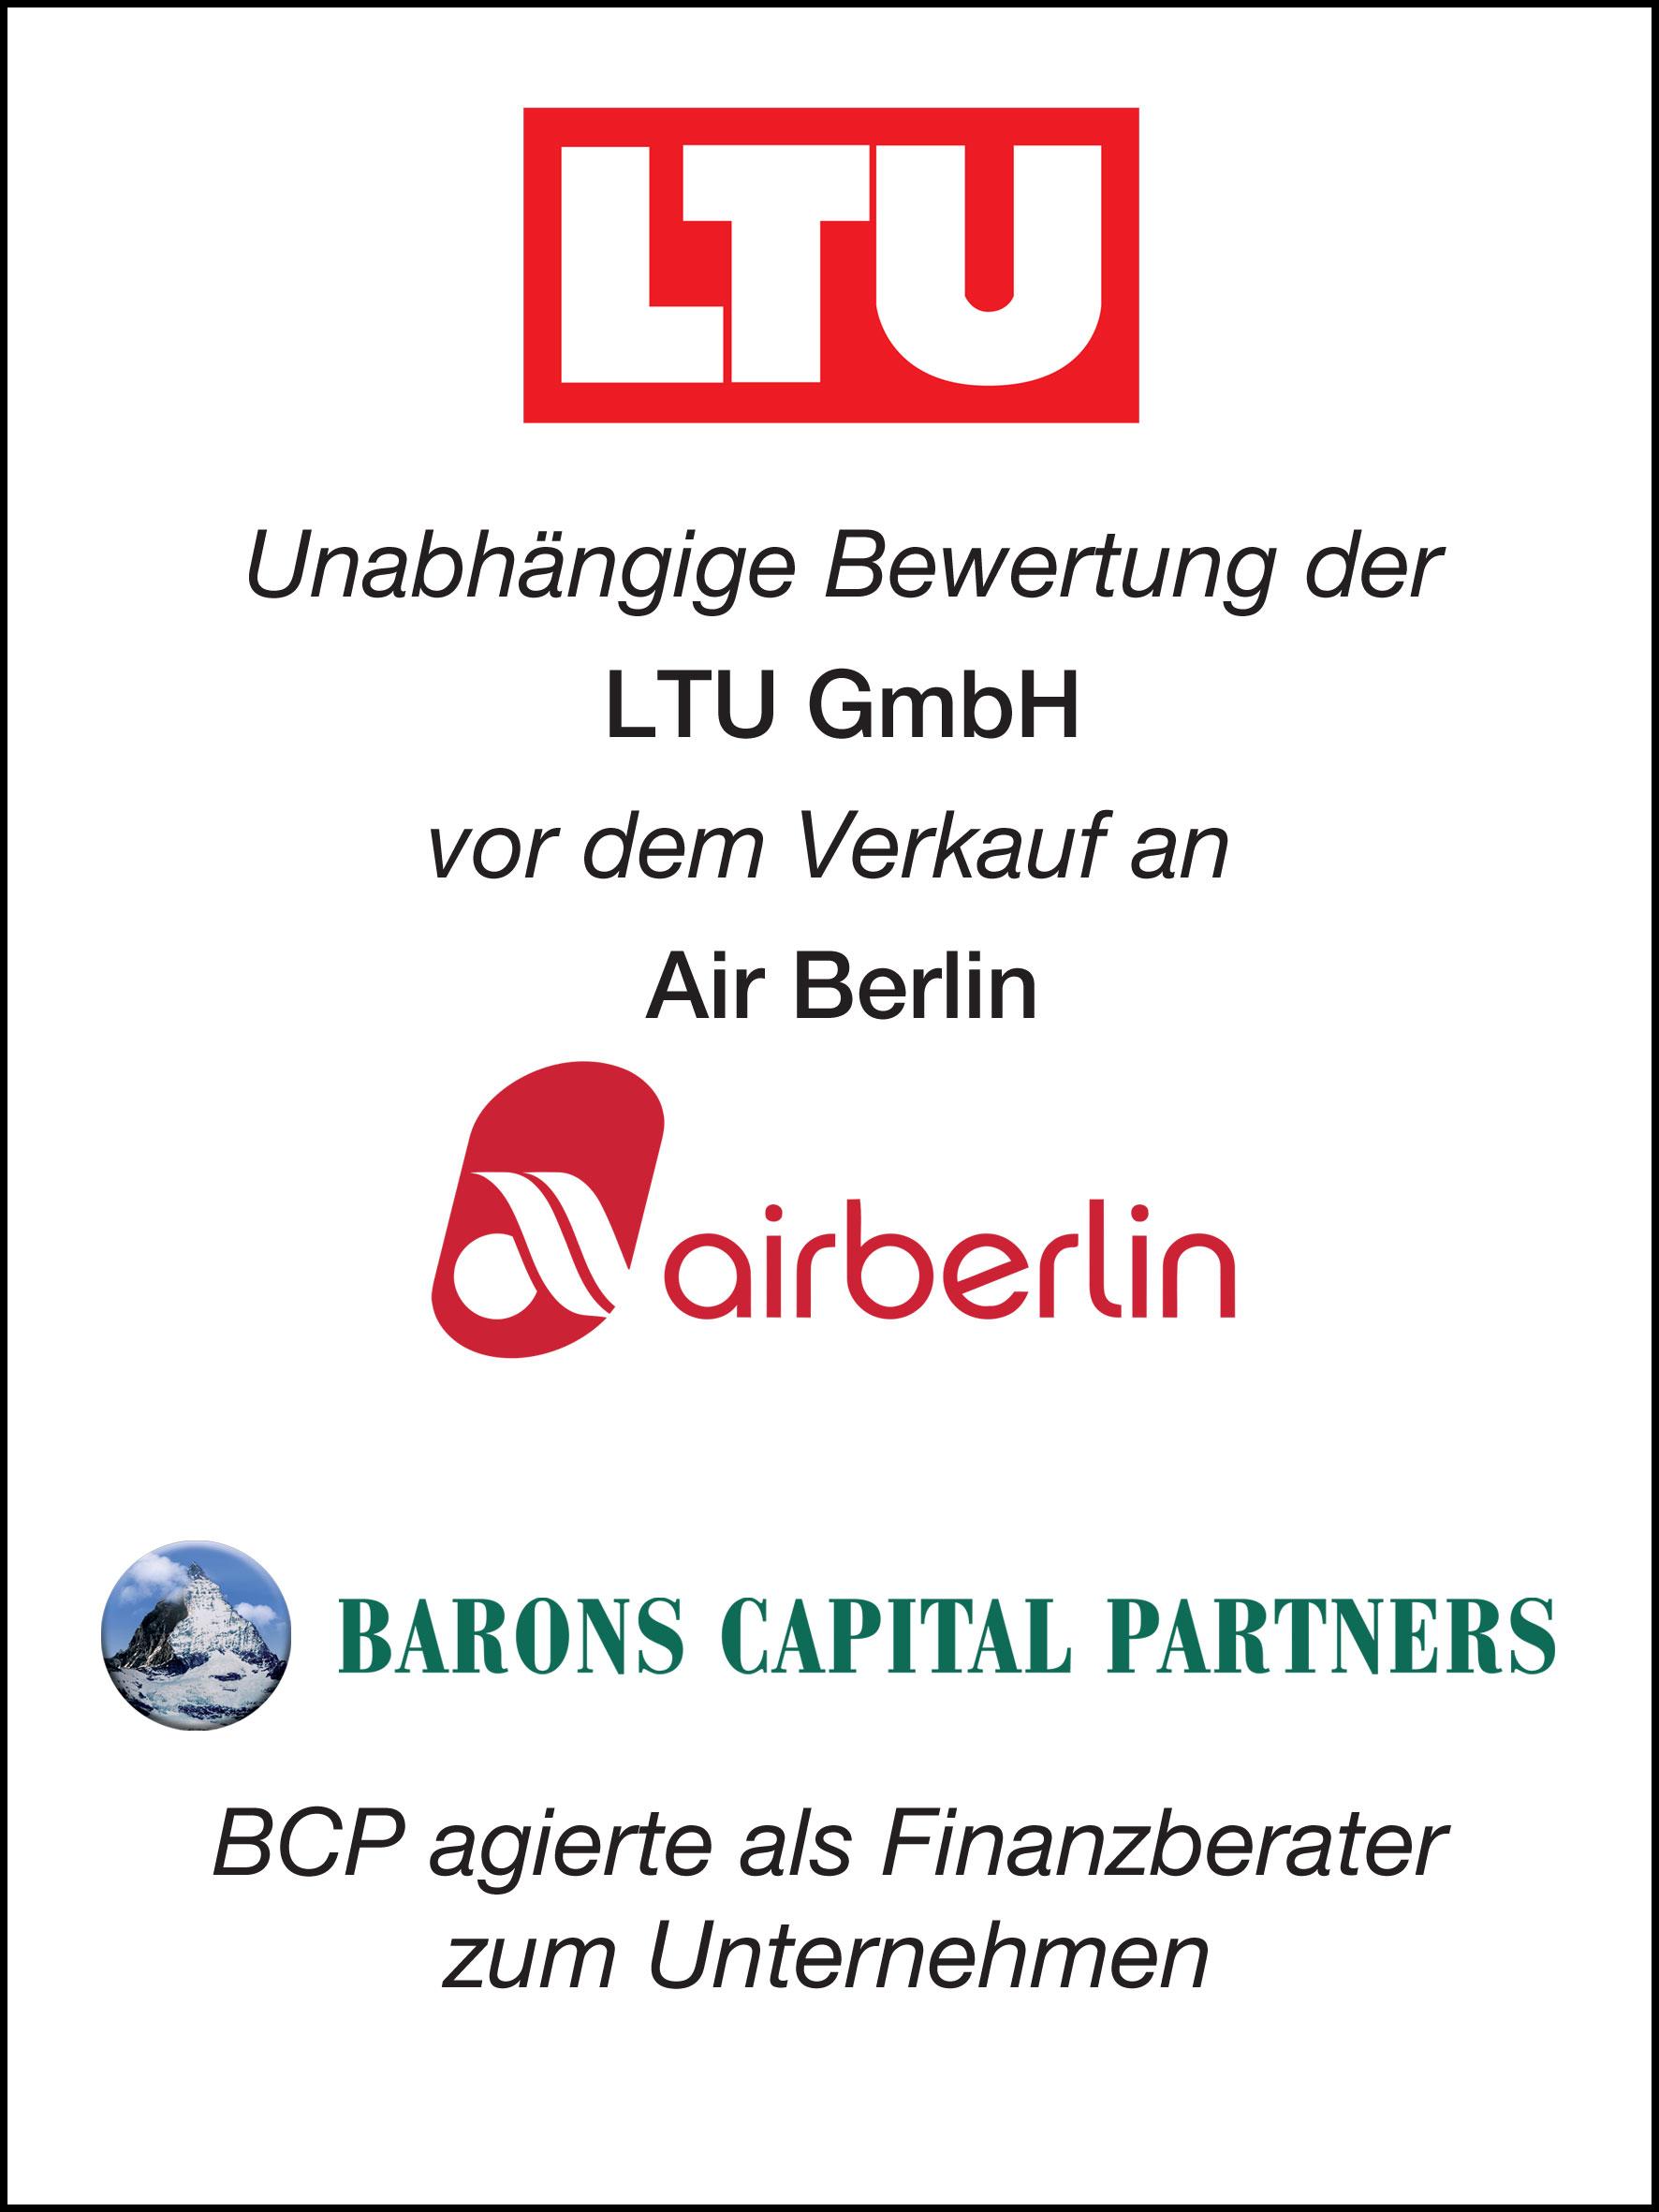 53_LTU GmbH_G